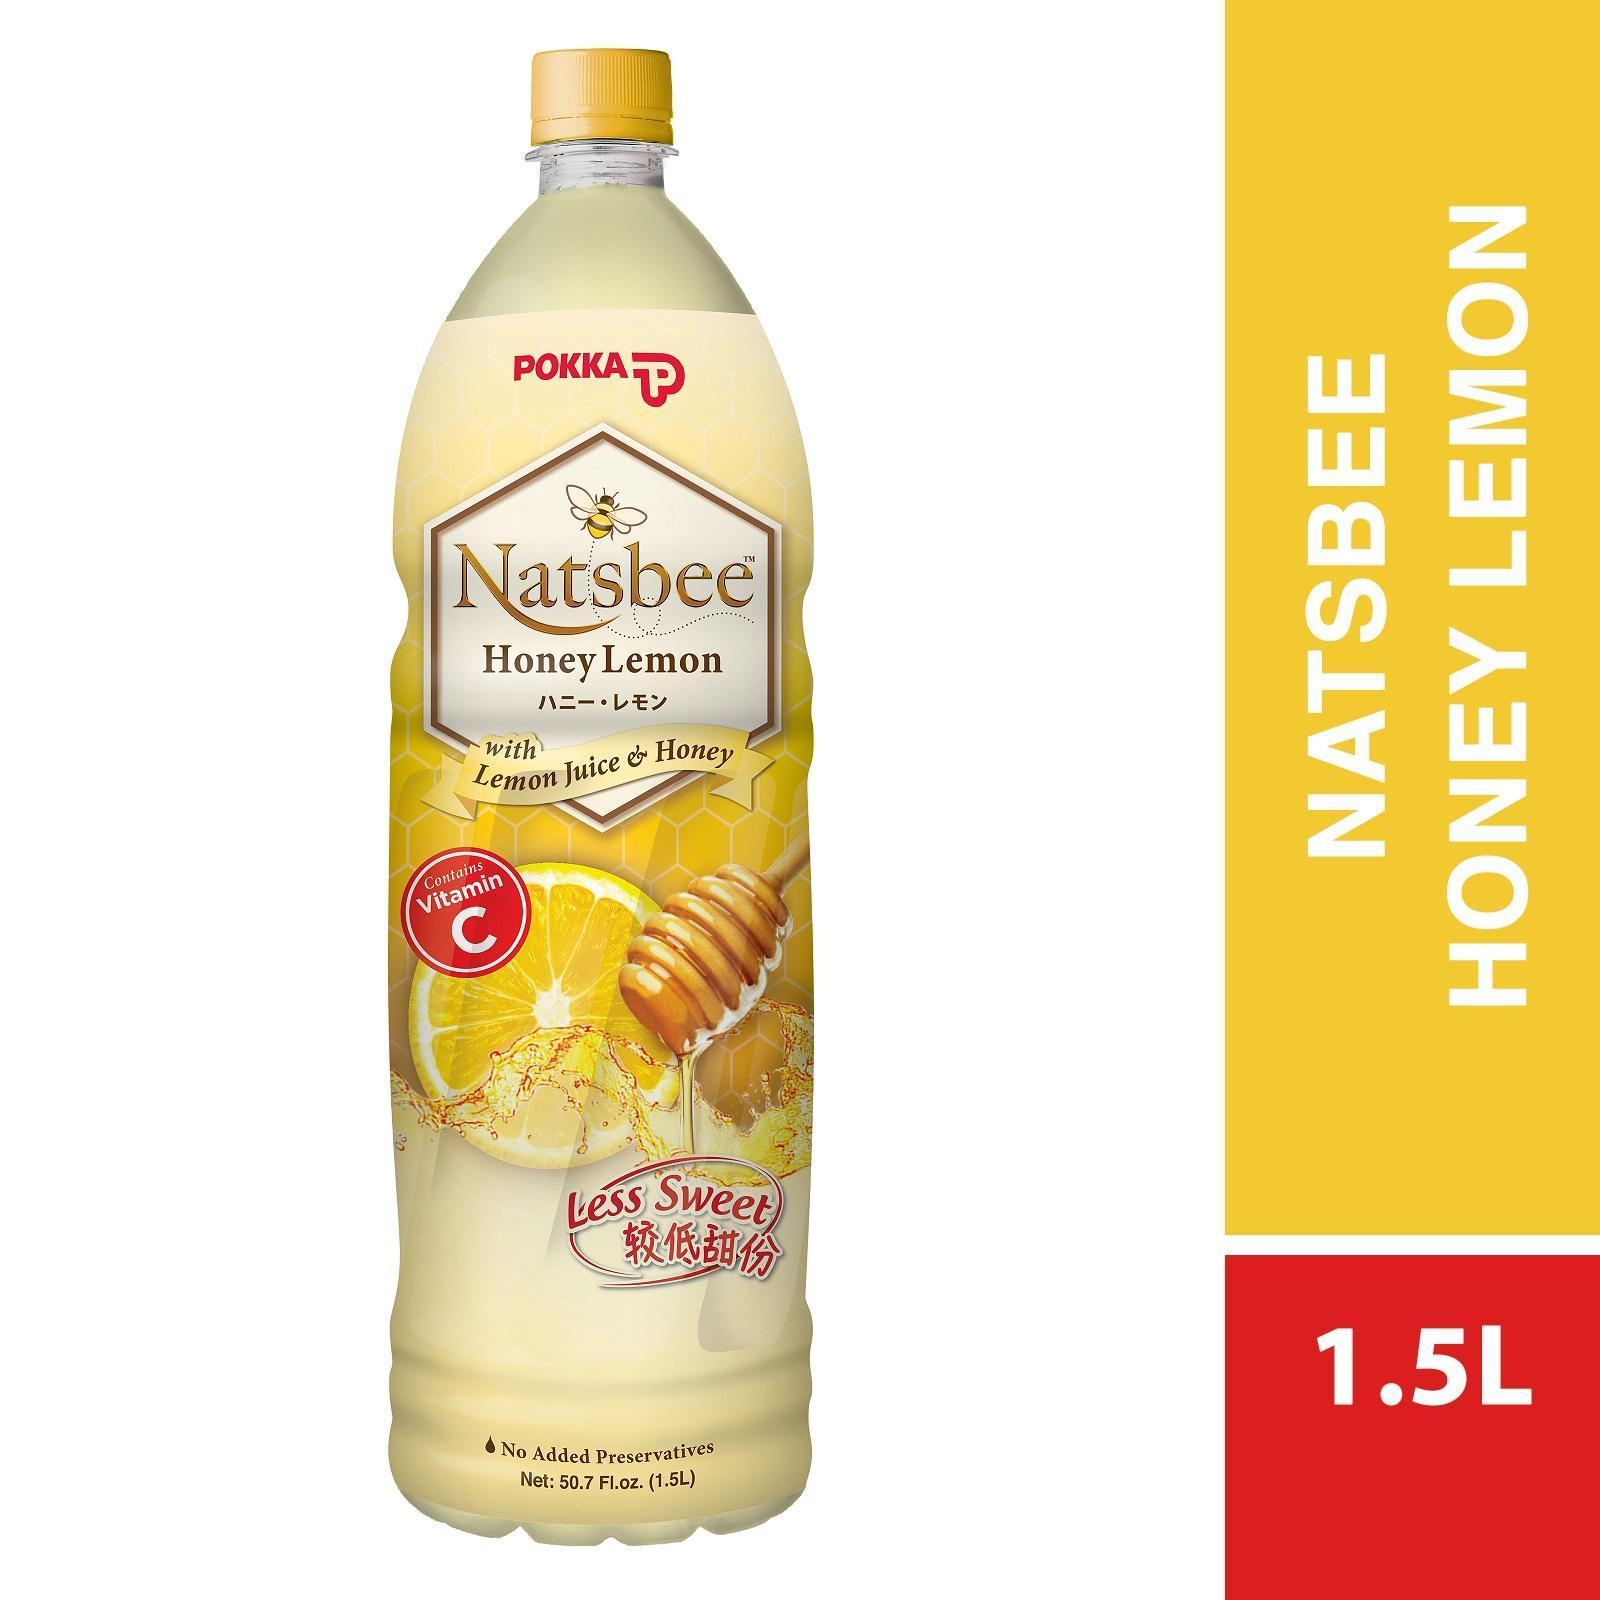 Pokka Natsbee Honey Lemon (Less Sweet) 1.5L